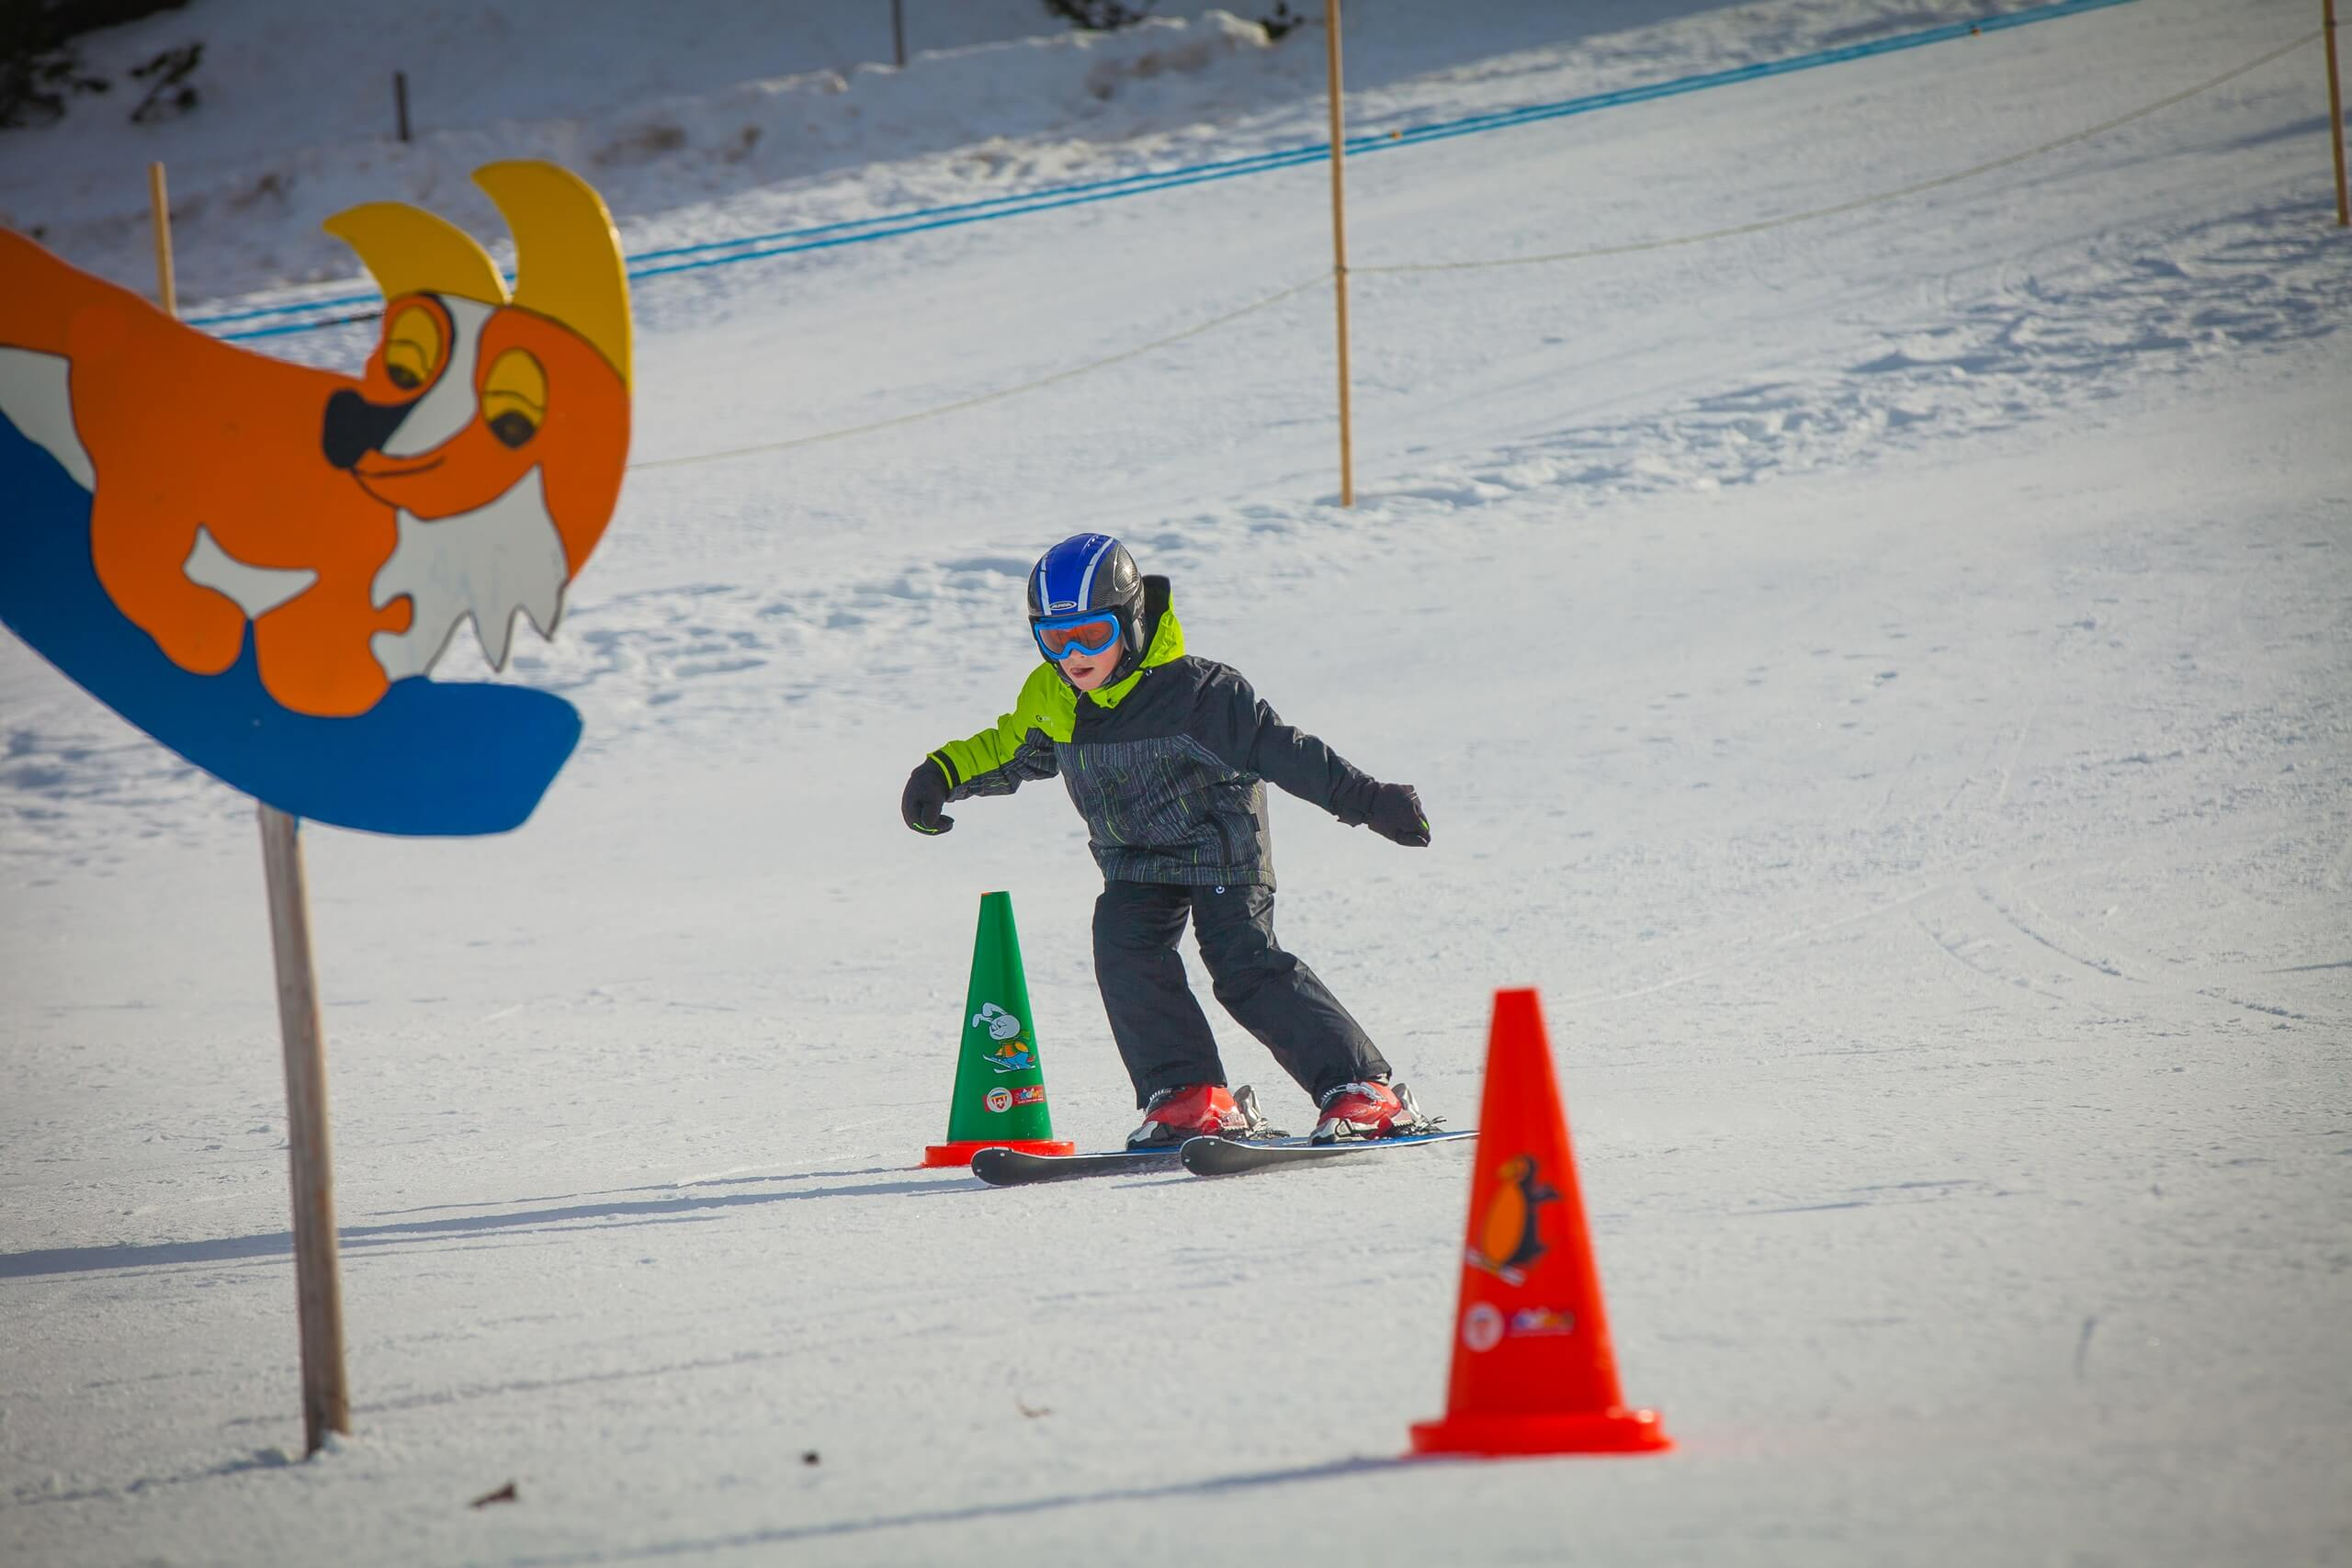 axalp-skigebiet-kind-skifahren-parcours-winteruebungen